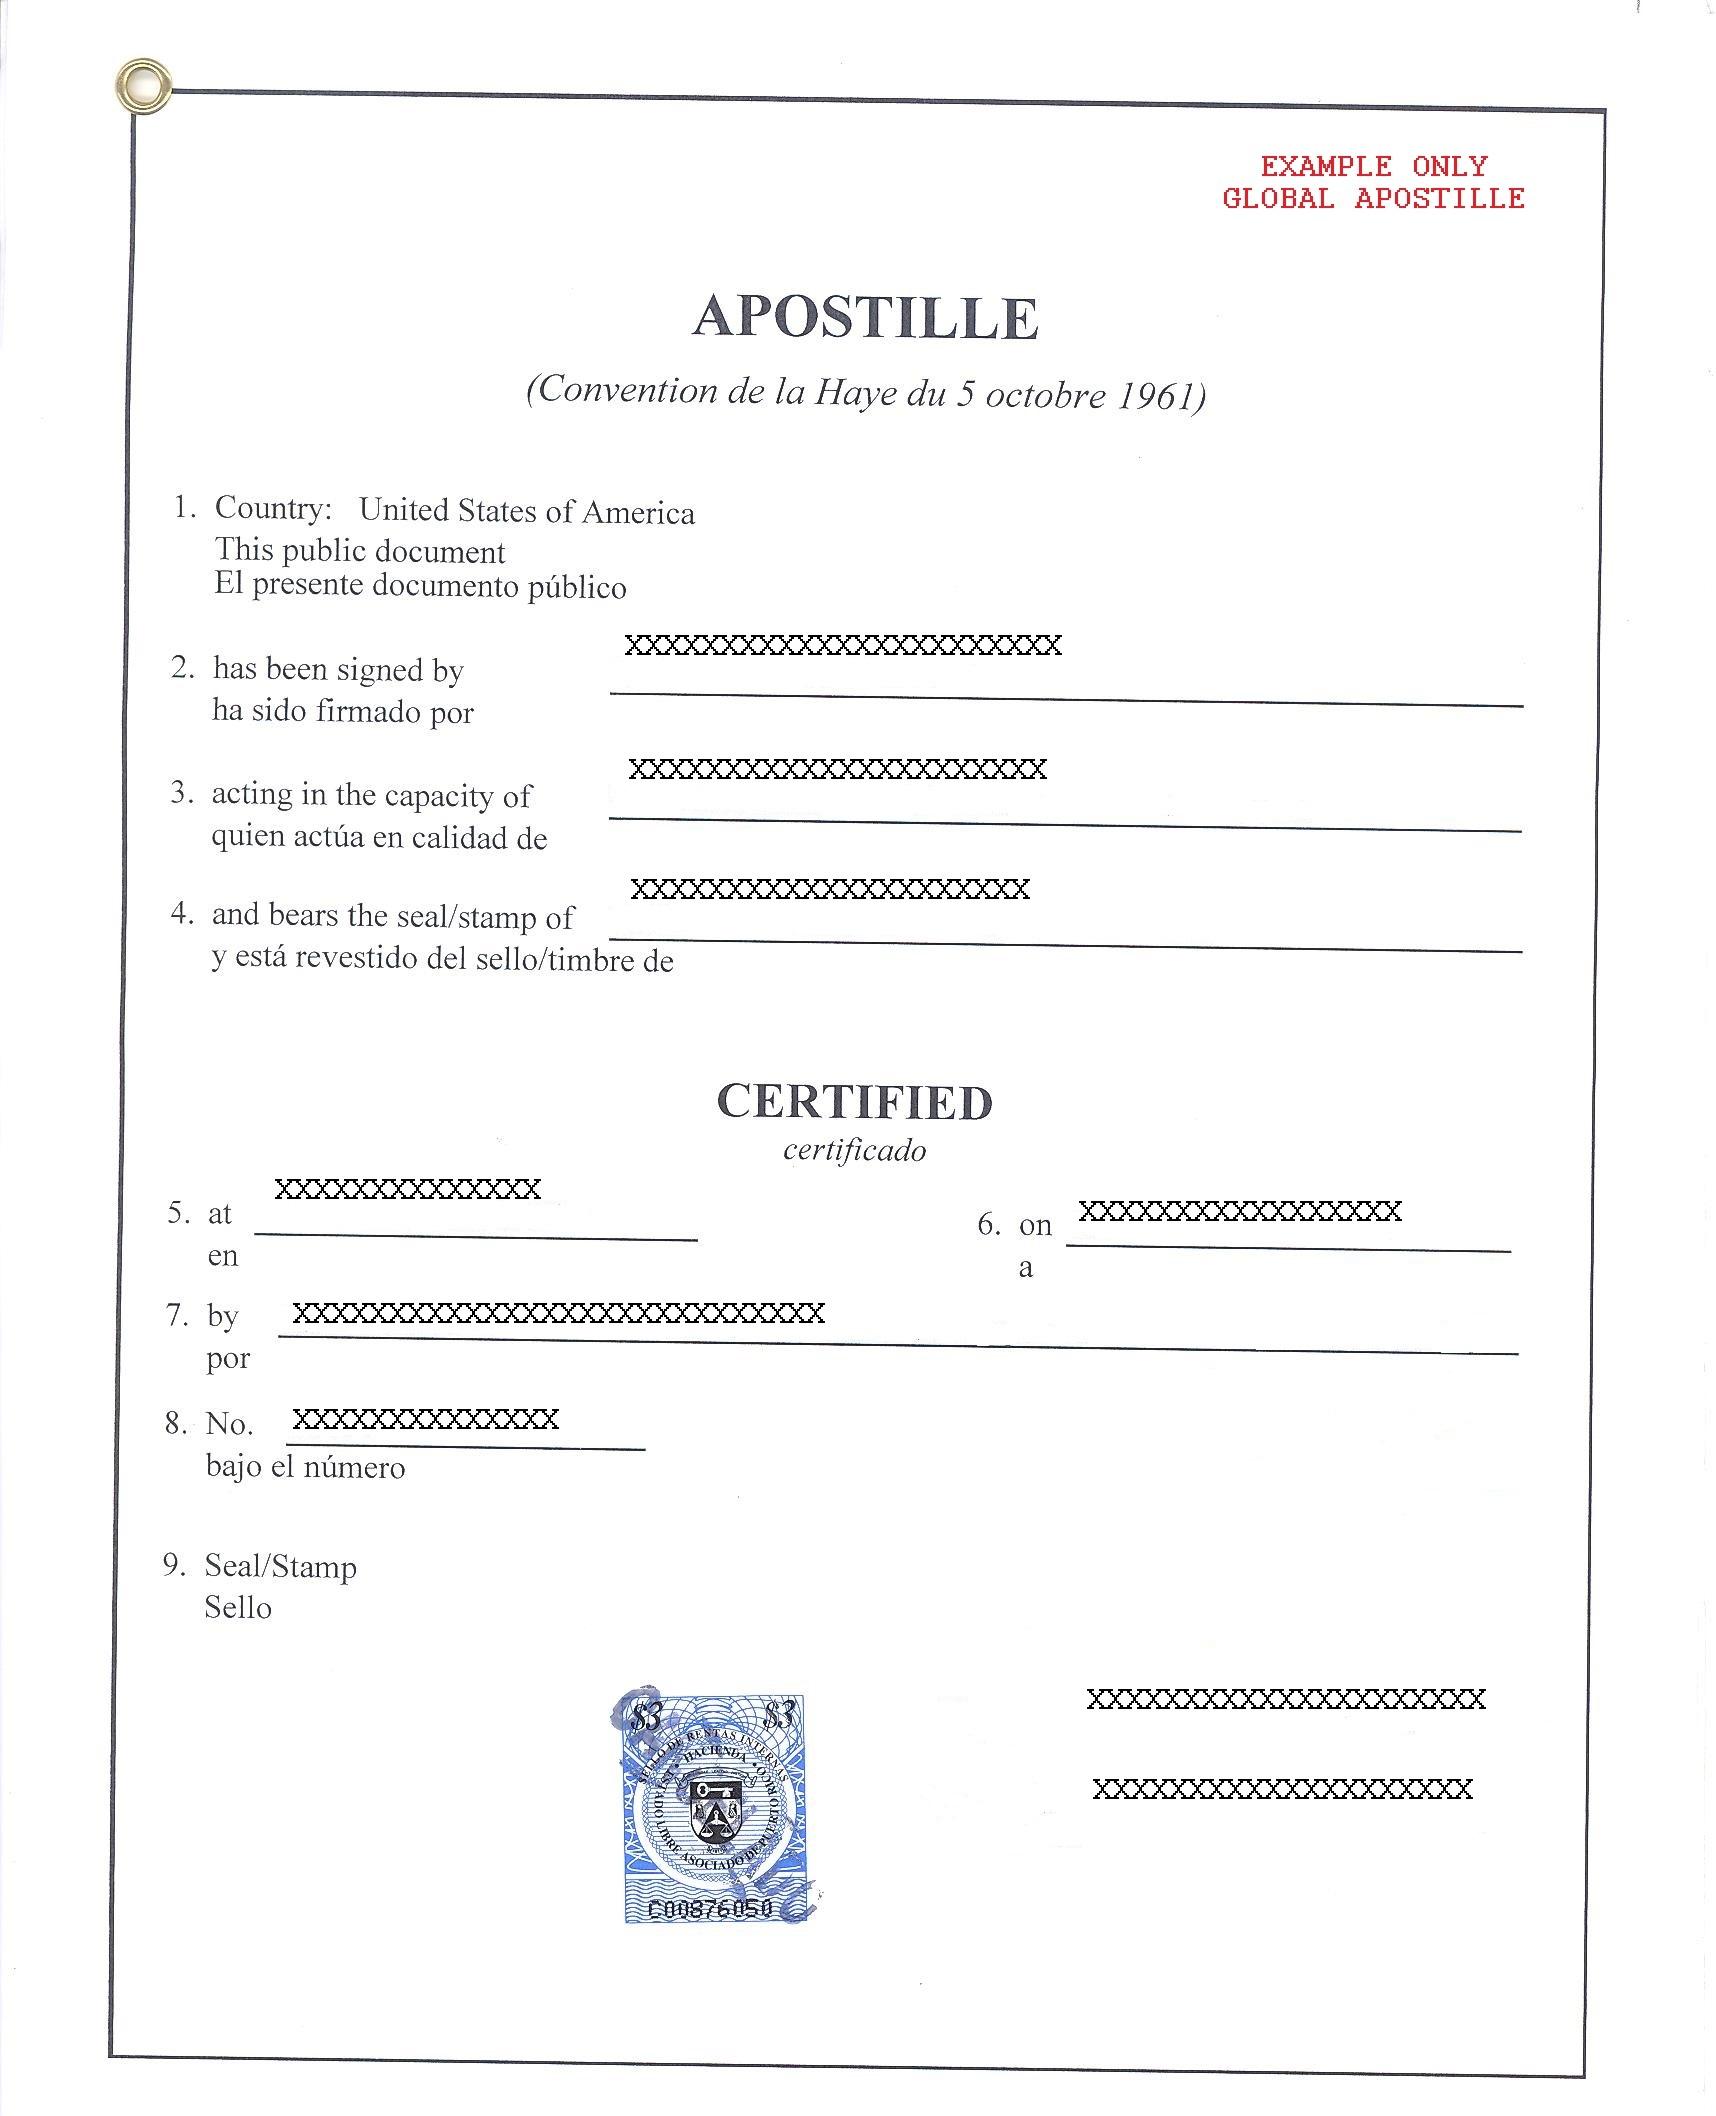 APOSTILLE PUERTO RICO, АПОСТИЛЬ В ПУЭРТО РИКО